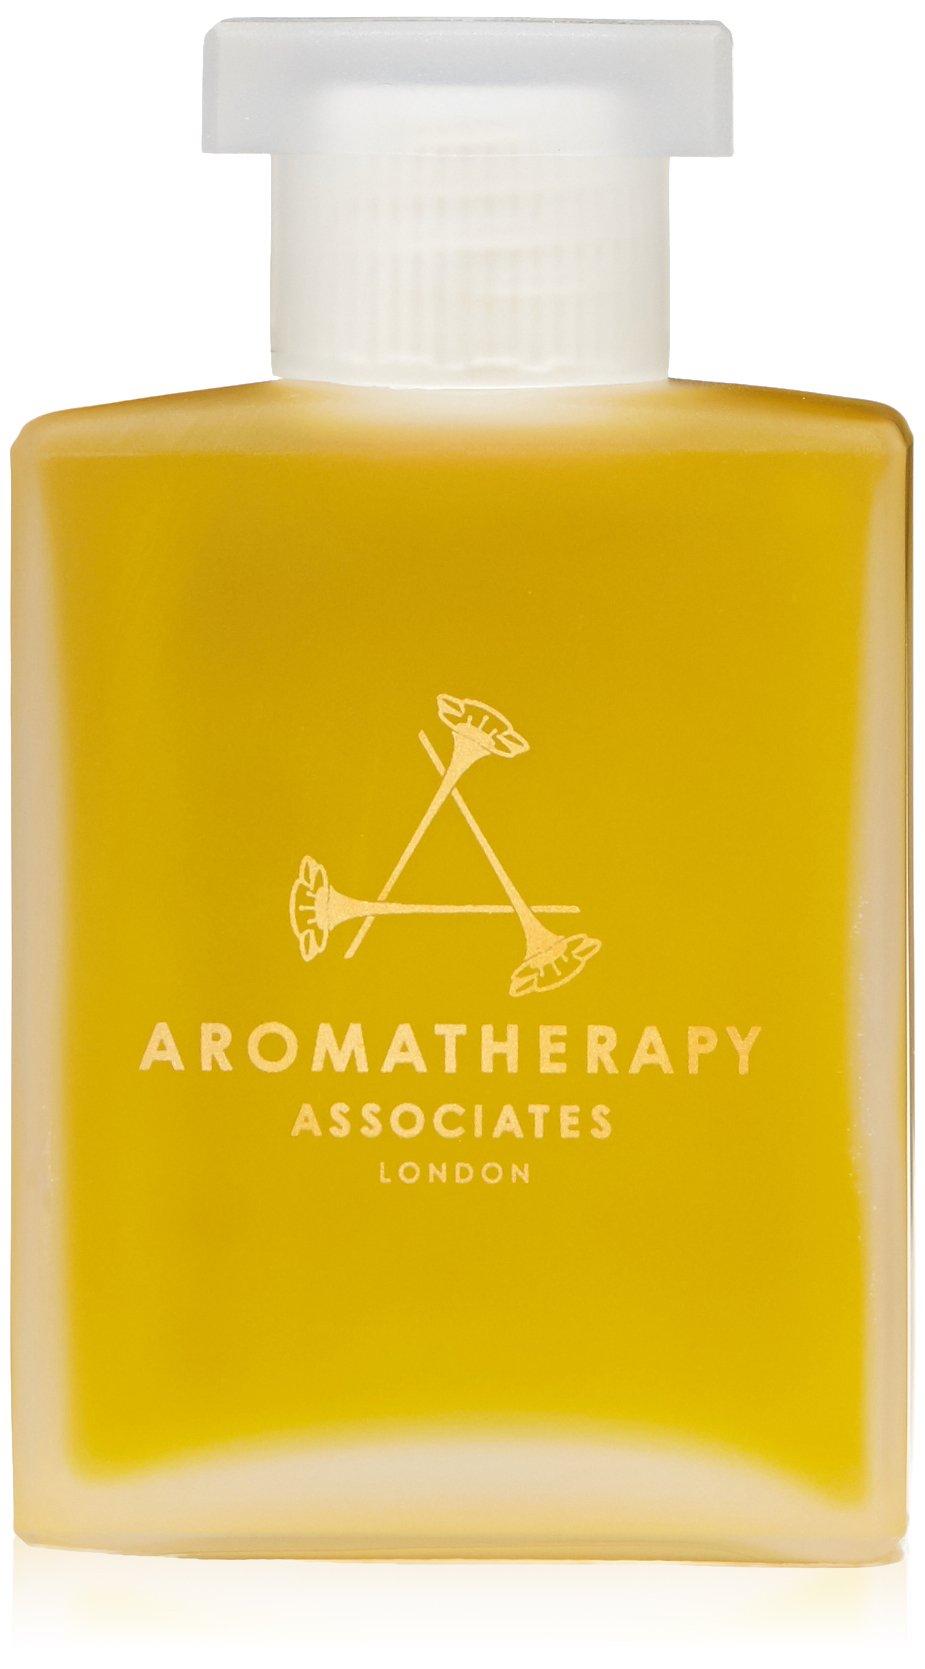 Aromatherapy Associates Inner Strength Bath & Shower Oil, 1.86 fl.oz.